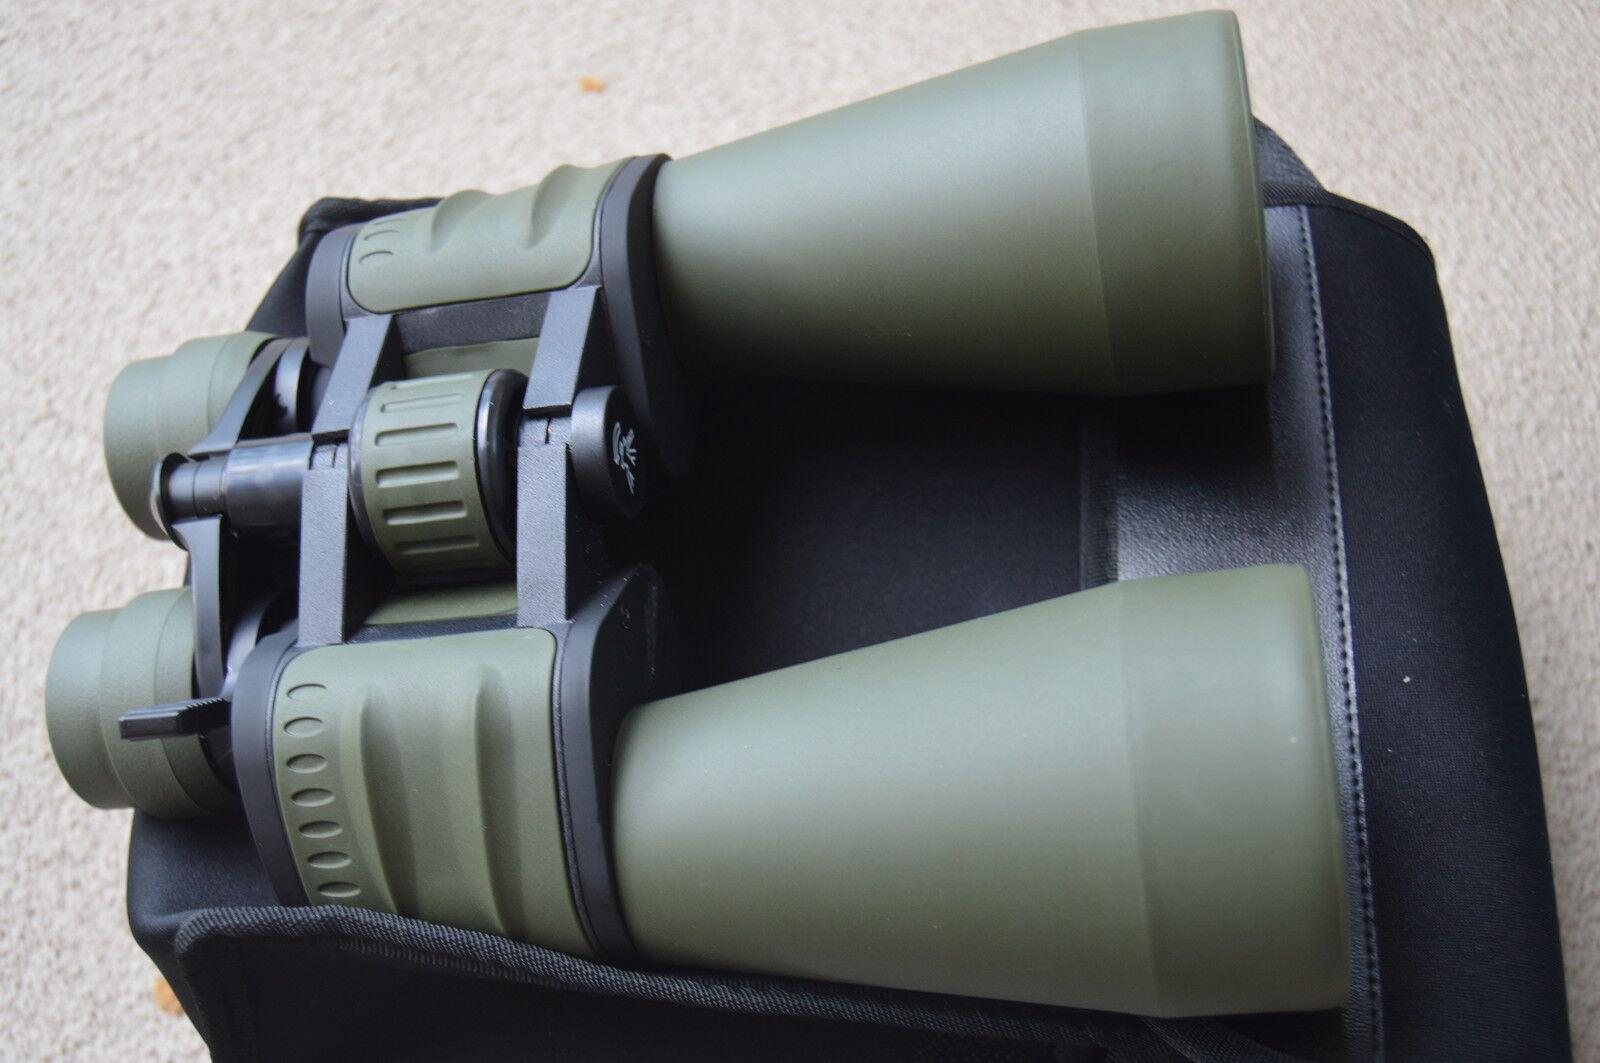 Huge  Day Night prism 10-120x90 Zoom Binoculars Camo Military Style  Full size